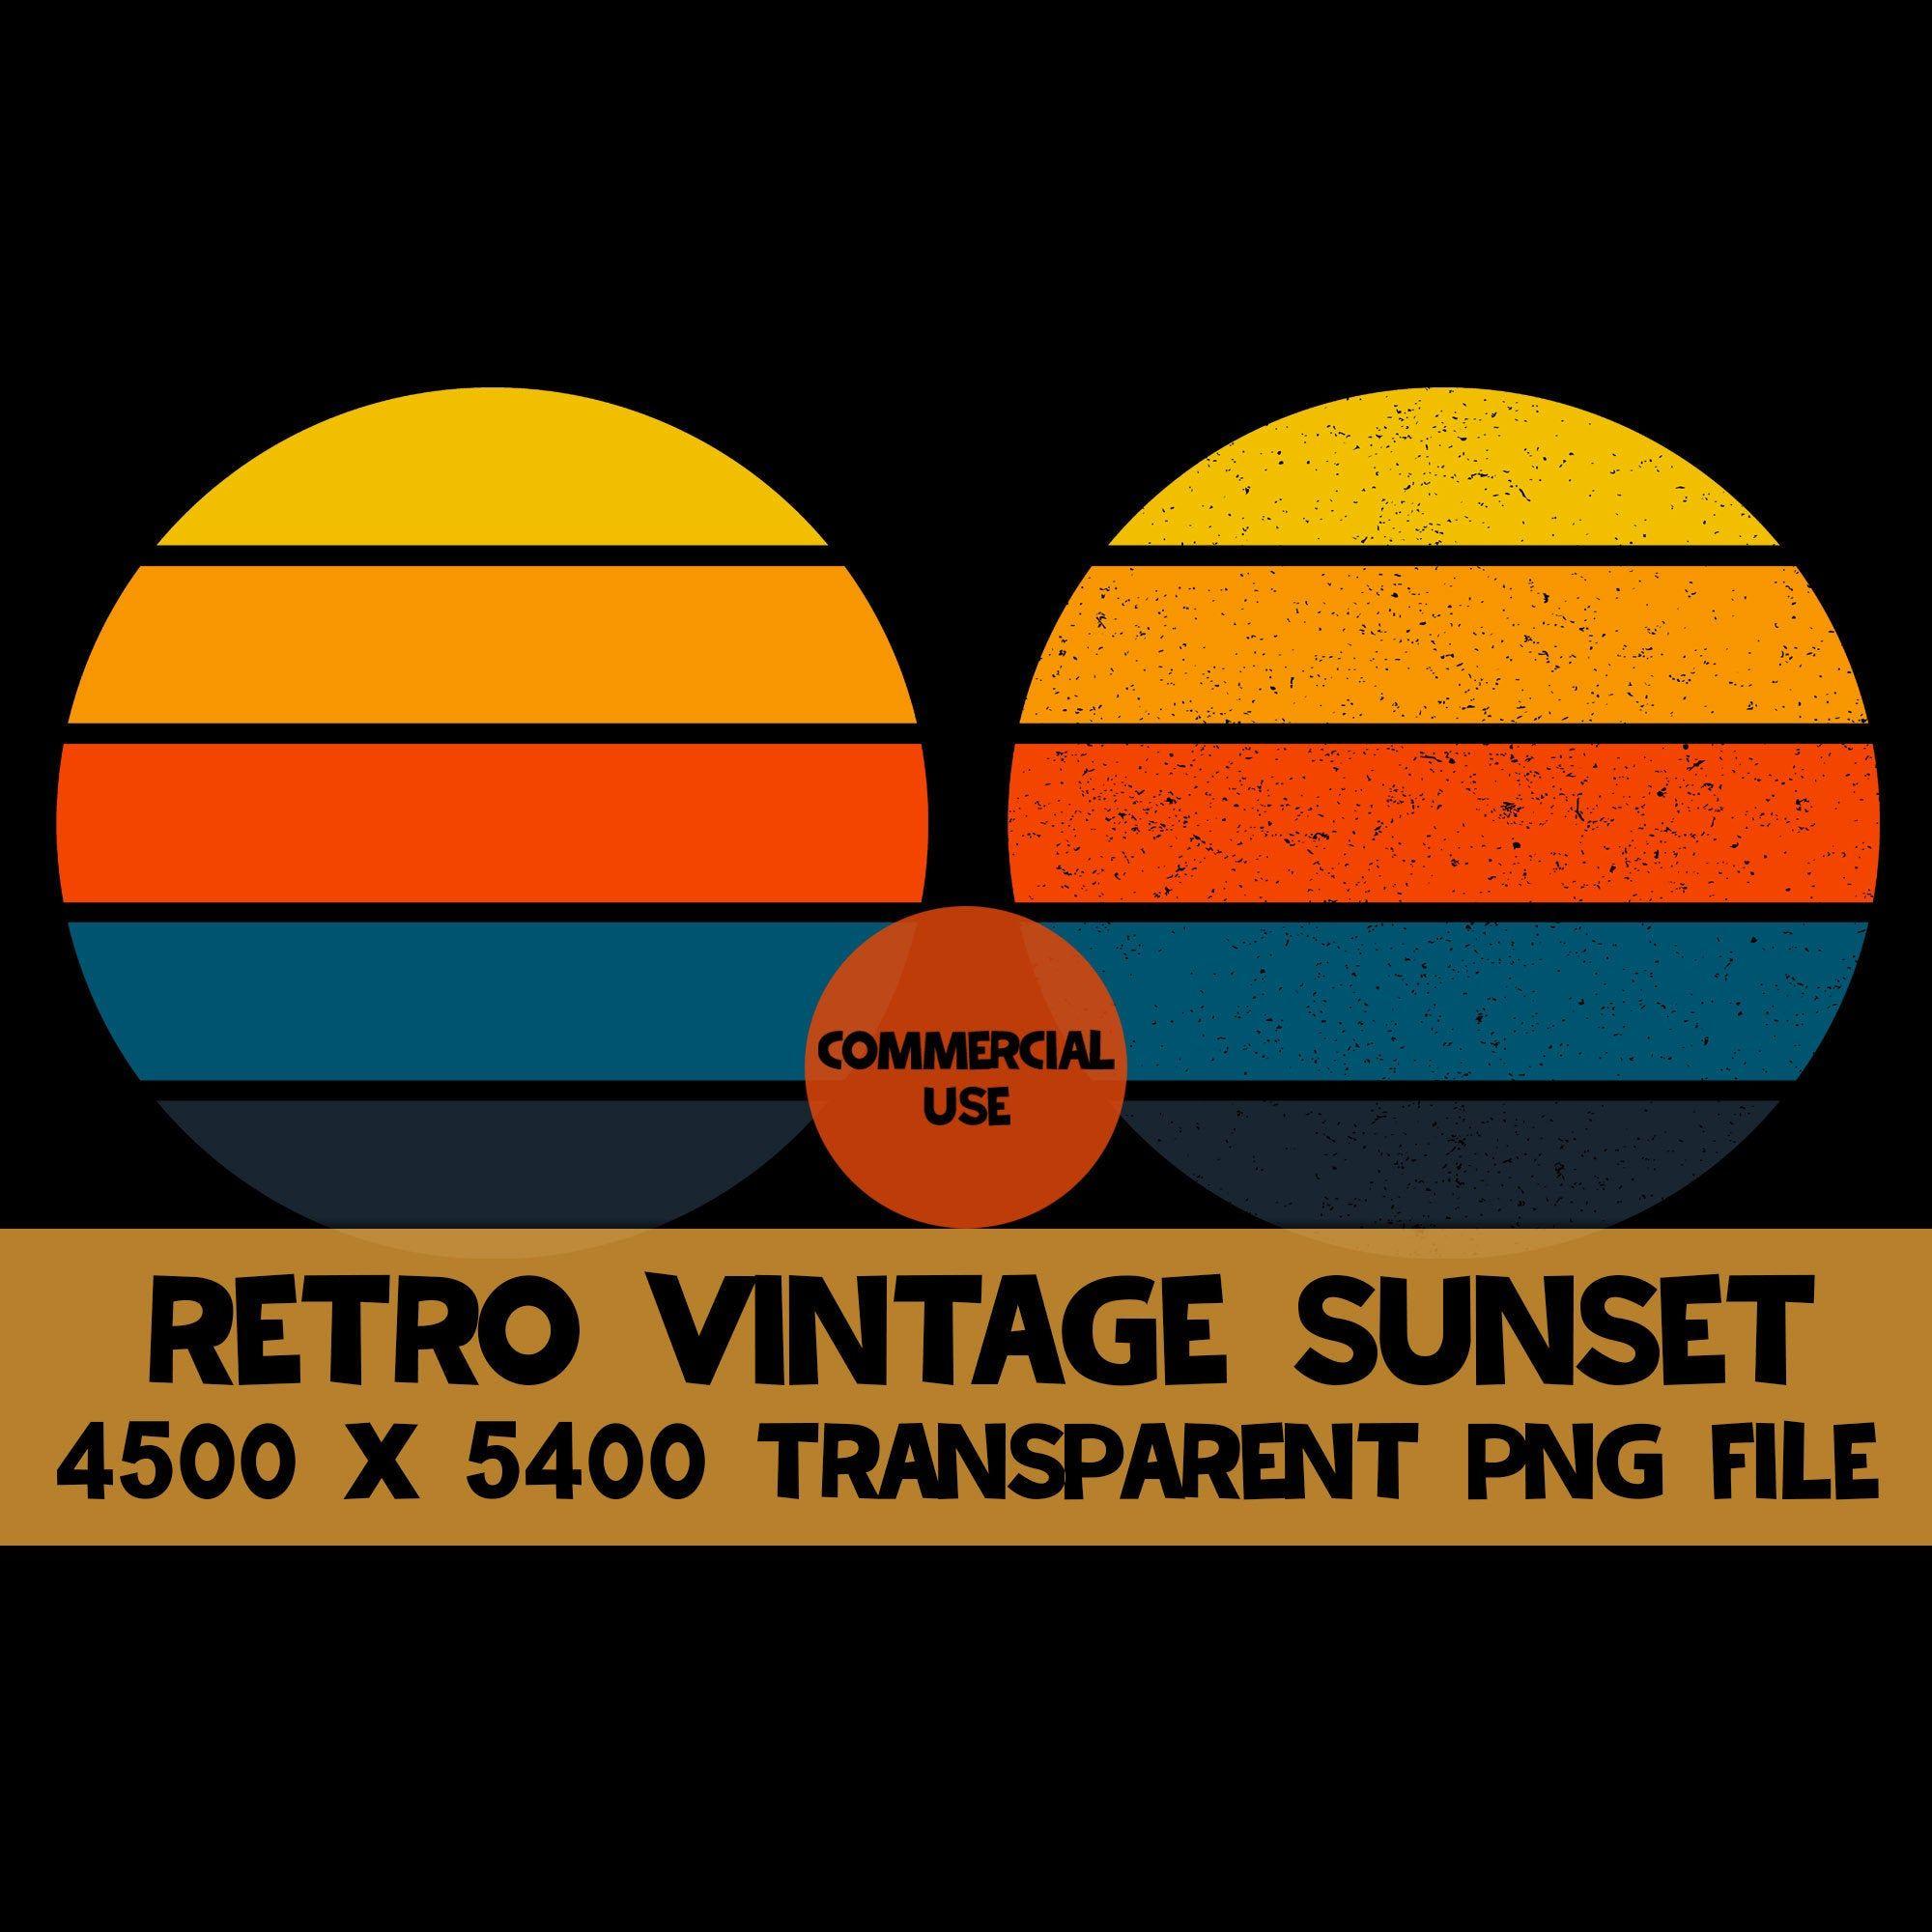 Retro Vintage Sunset 2 Pack Png Background Clip Art Distressed Etsy Clip Art Retro Vintage Retro